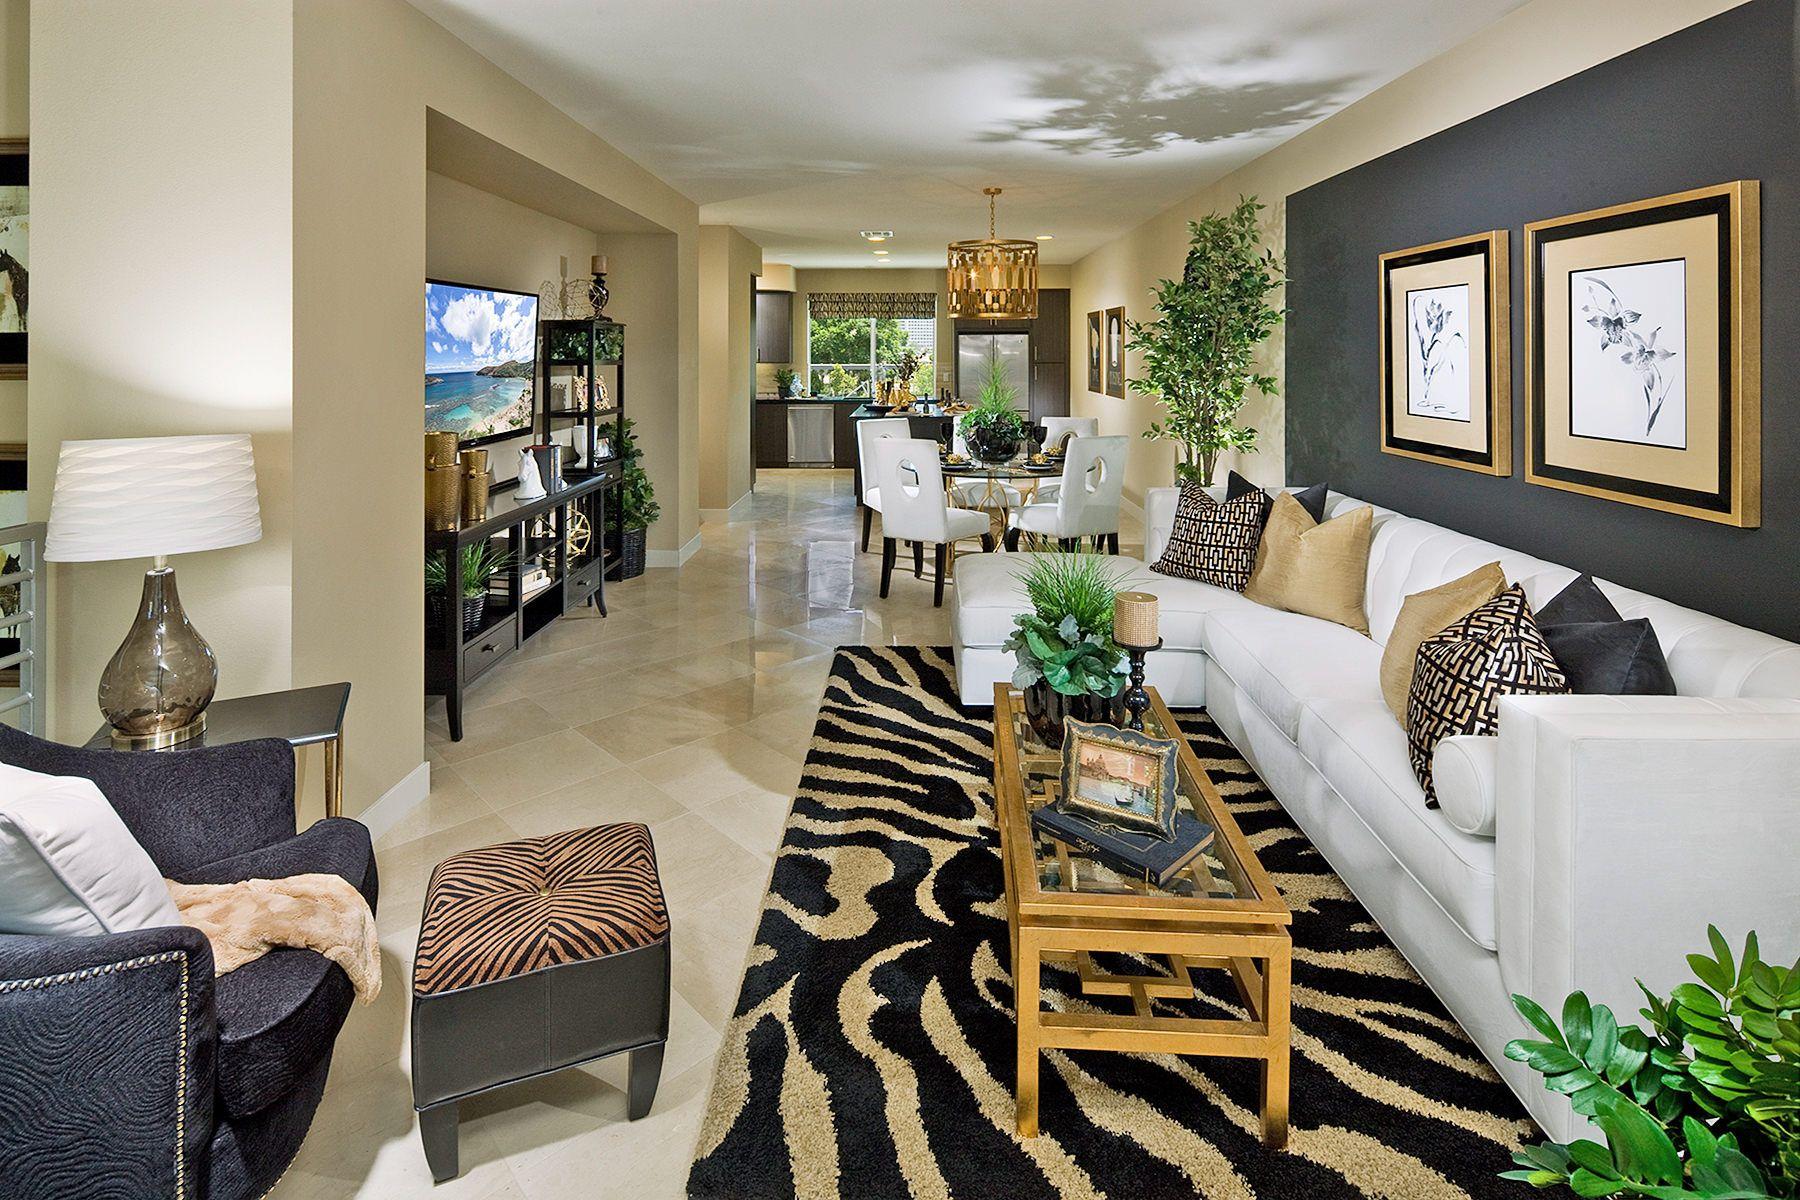 Ambrosia Interior Design